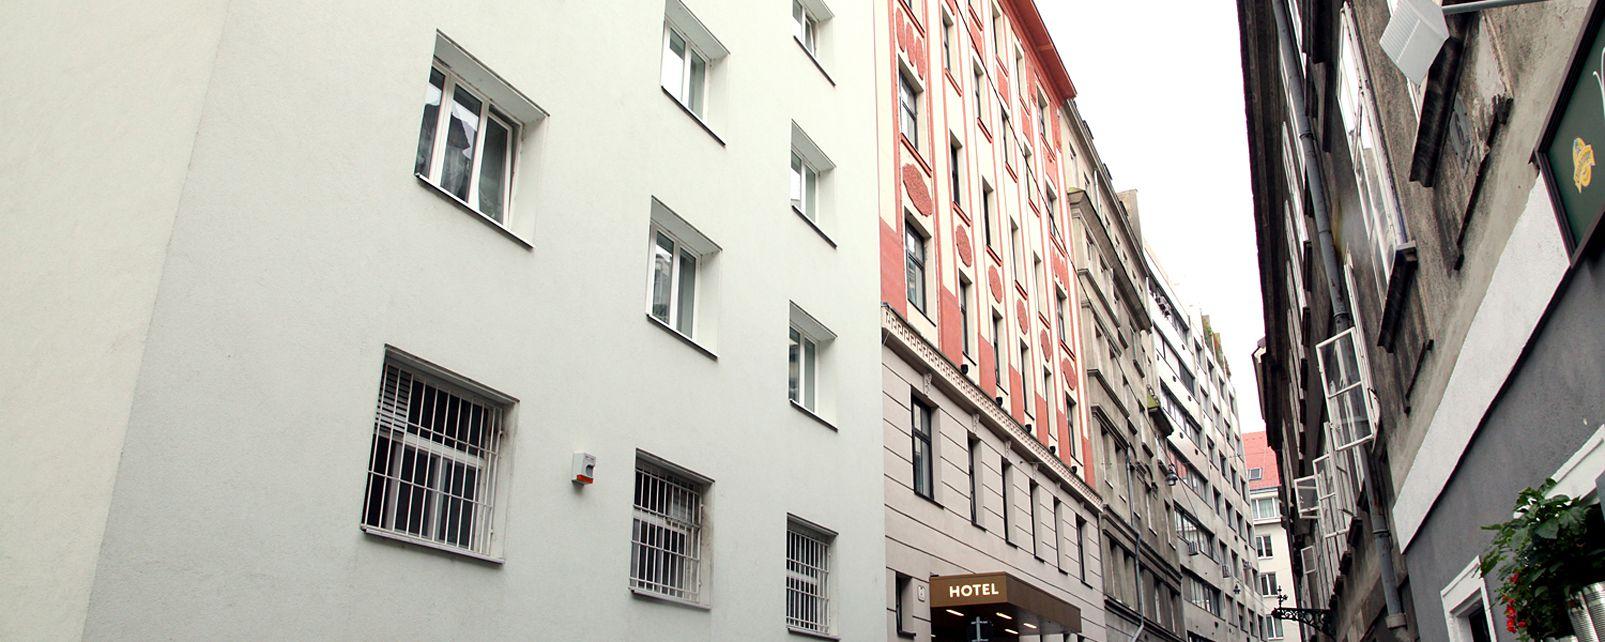 Hôtel Alma Boutique-Hotel